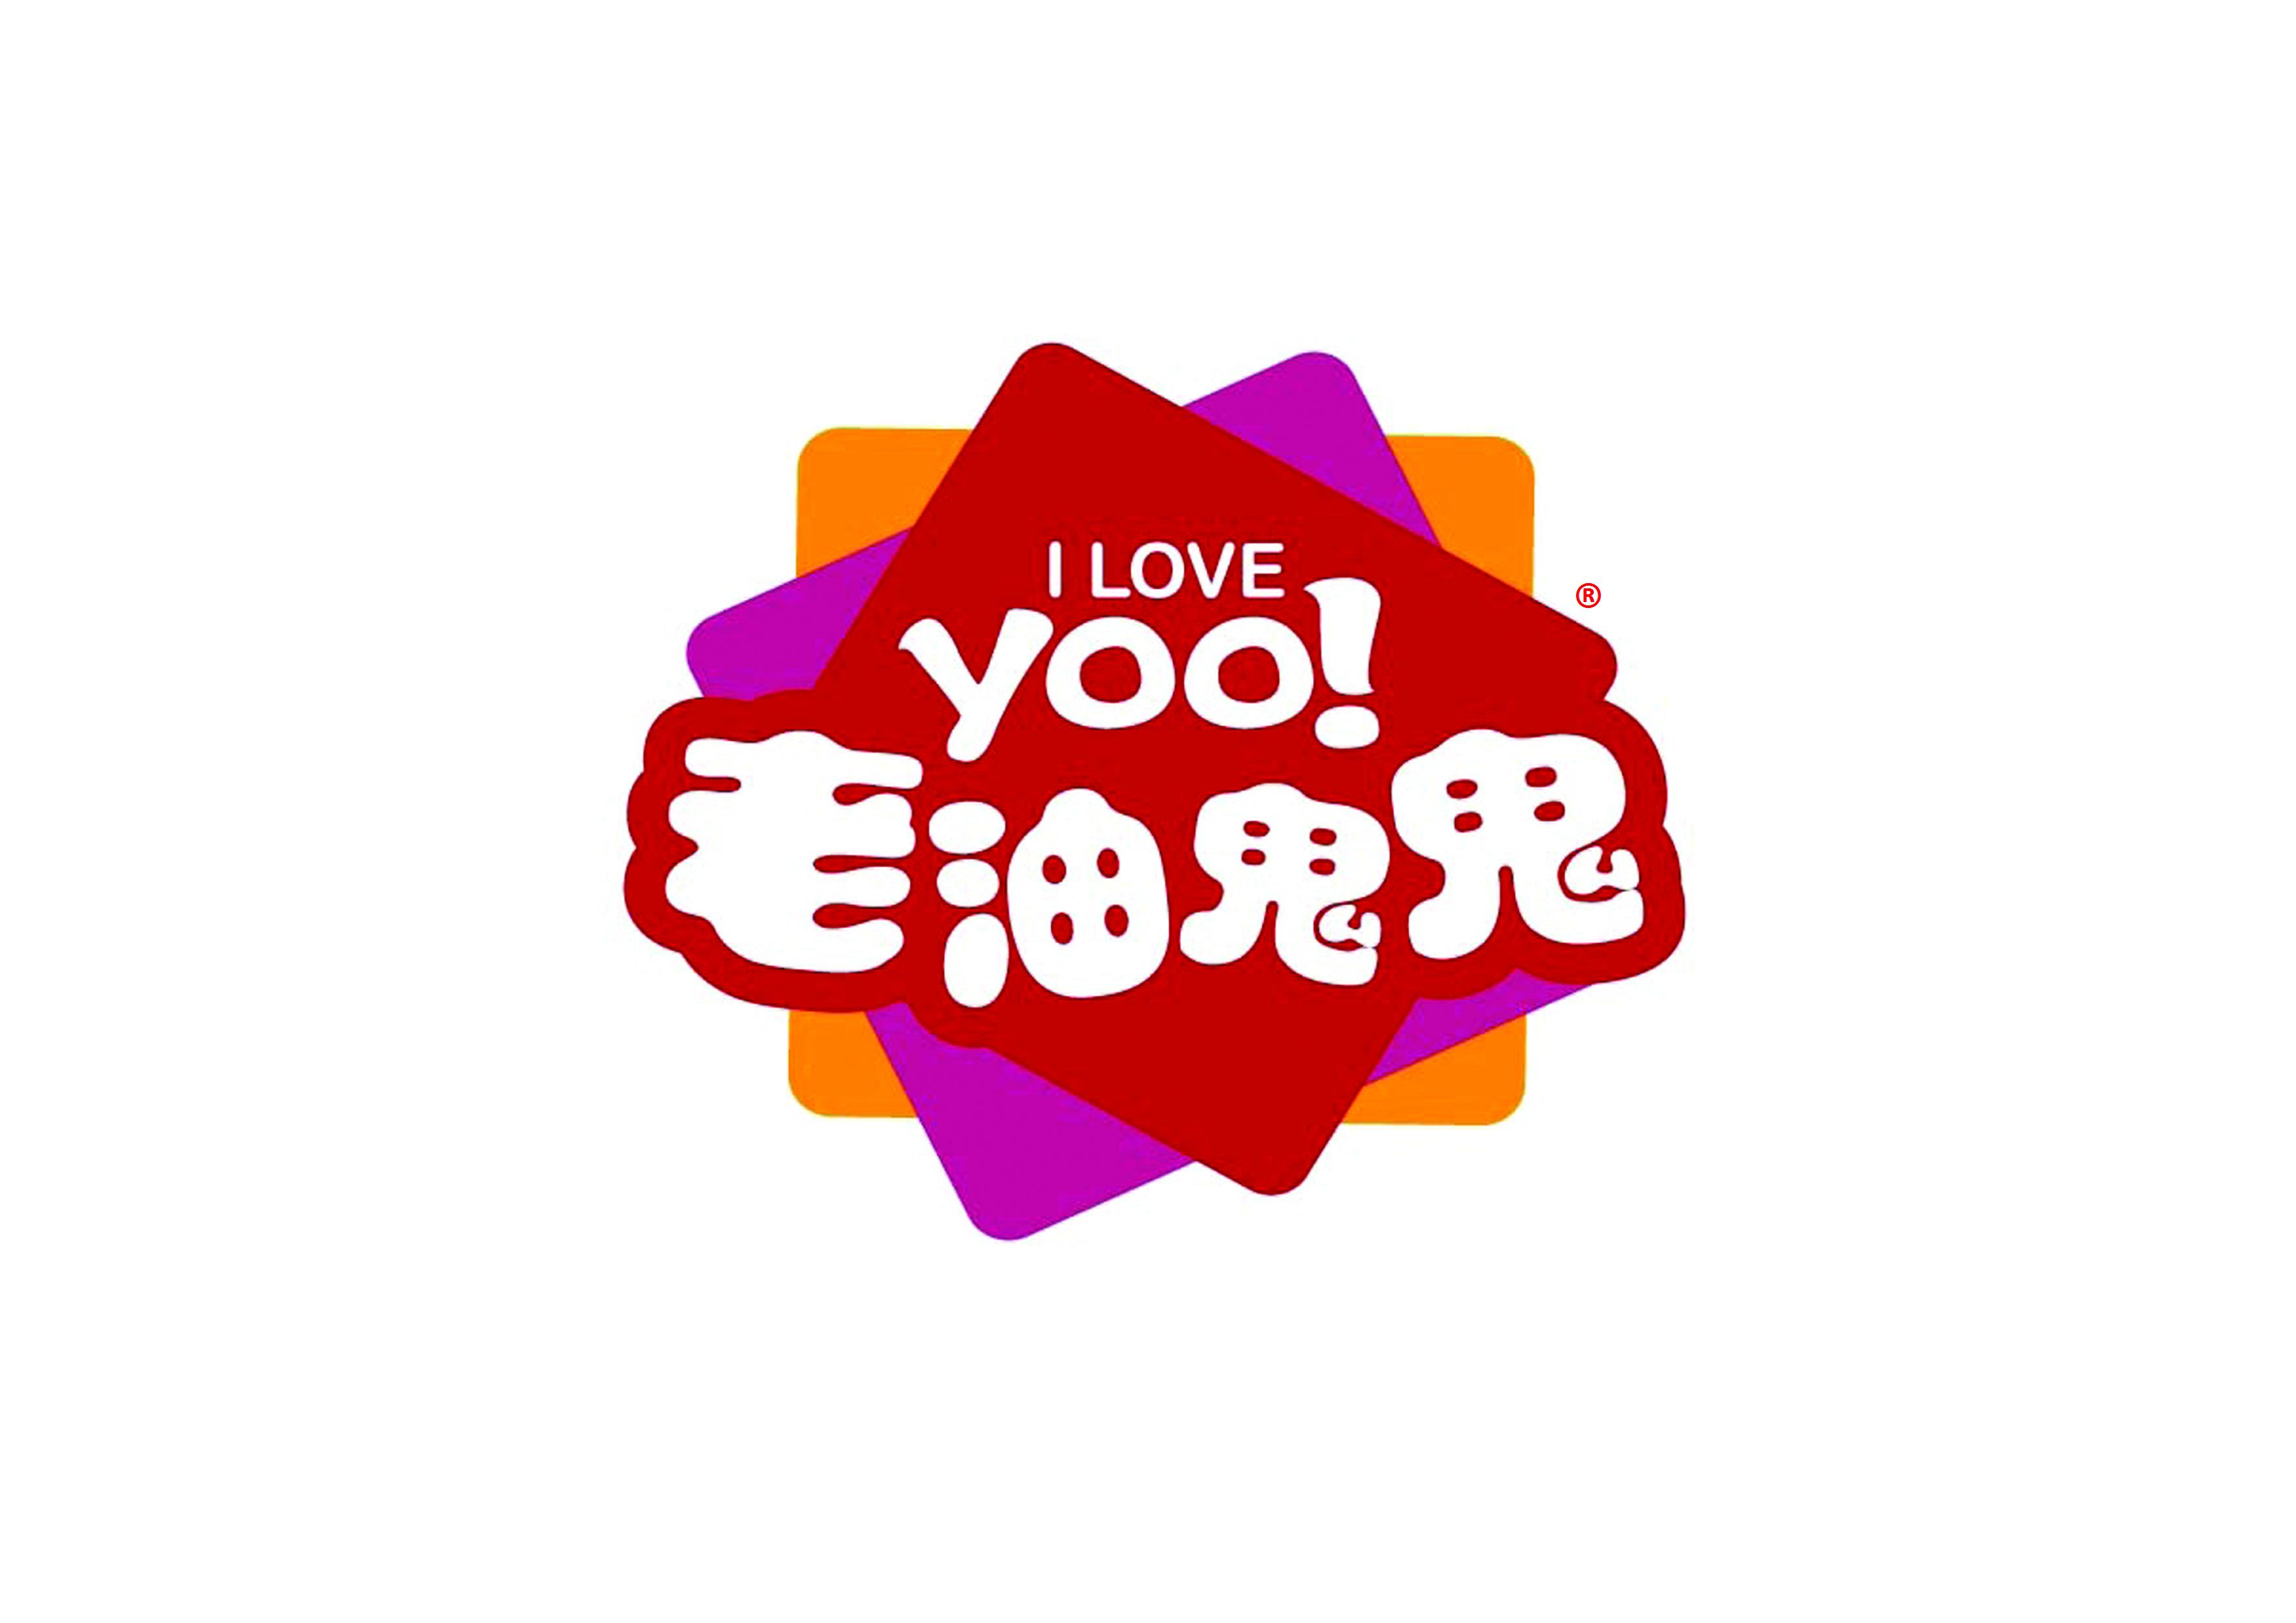 i-love-yoo